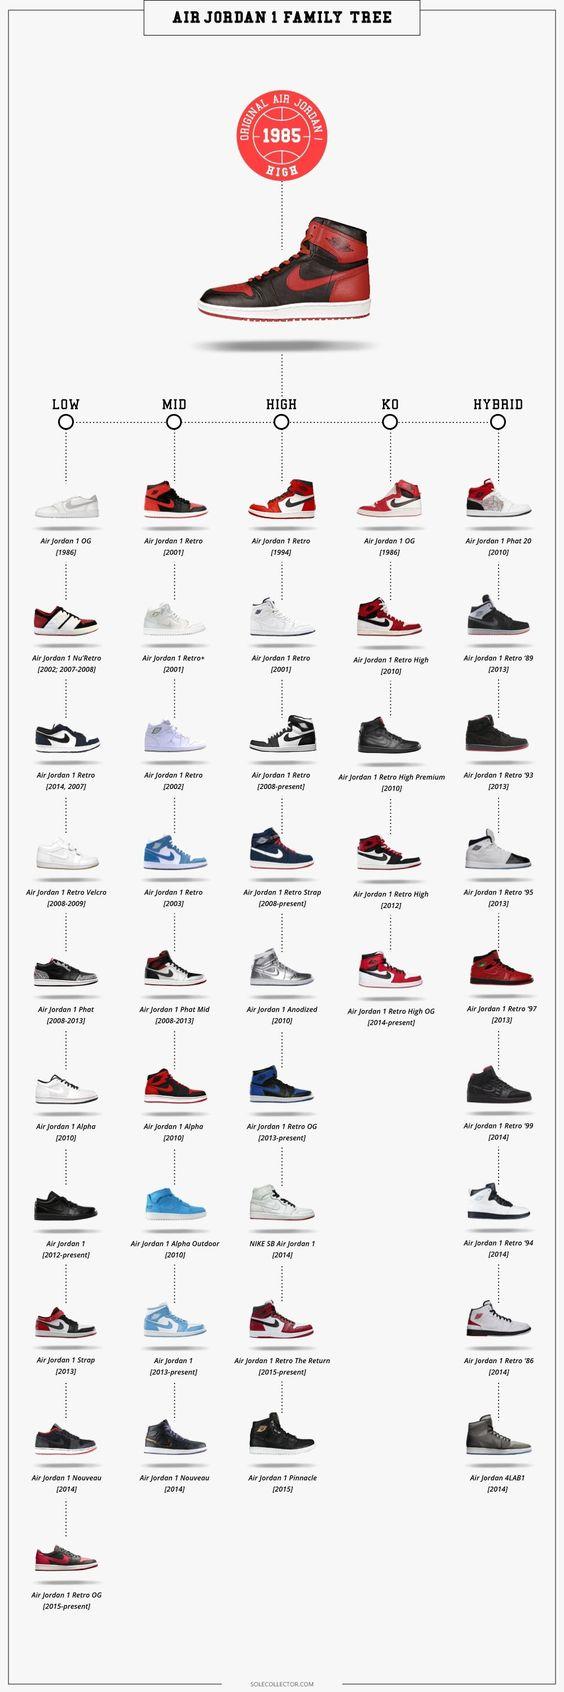 The Genealogy of the Air Jordan 1